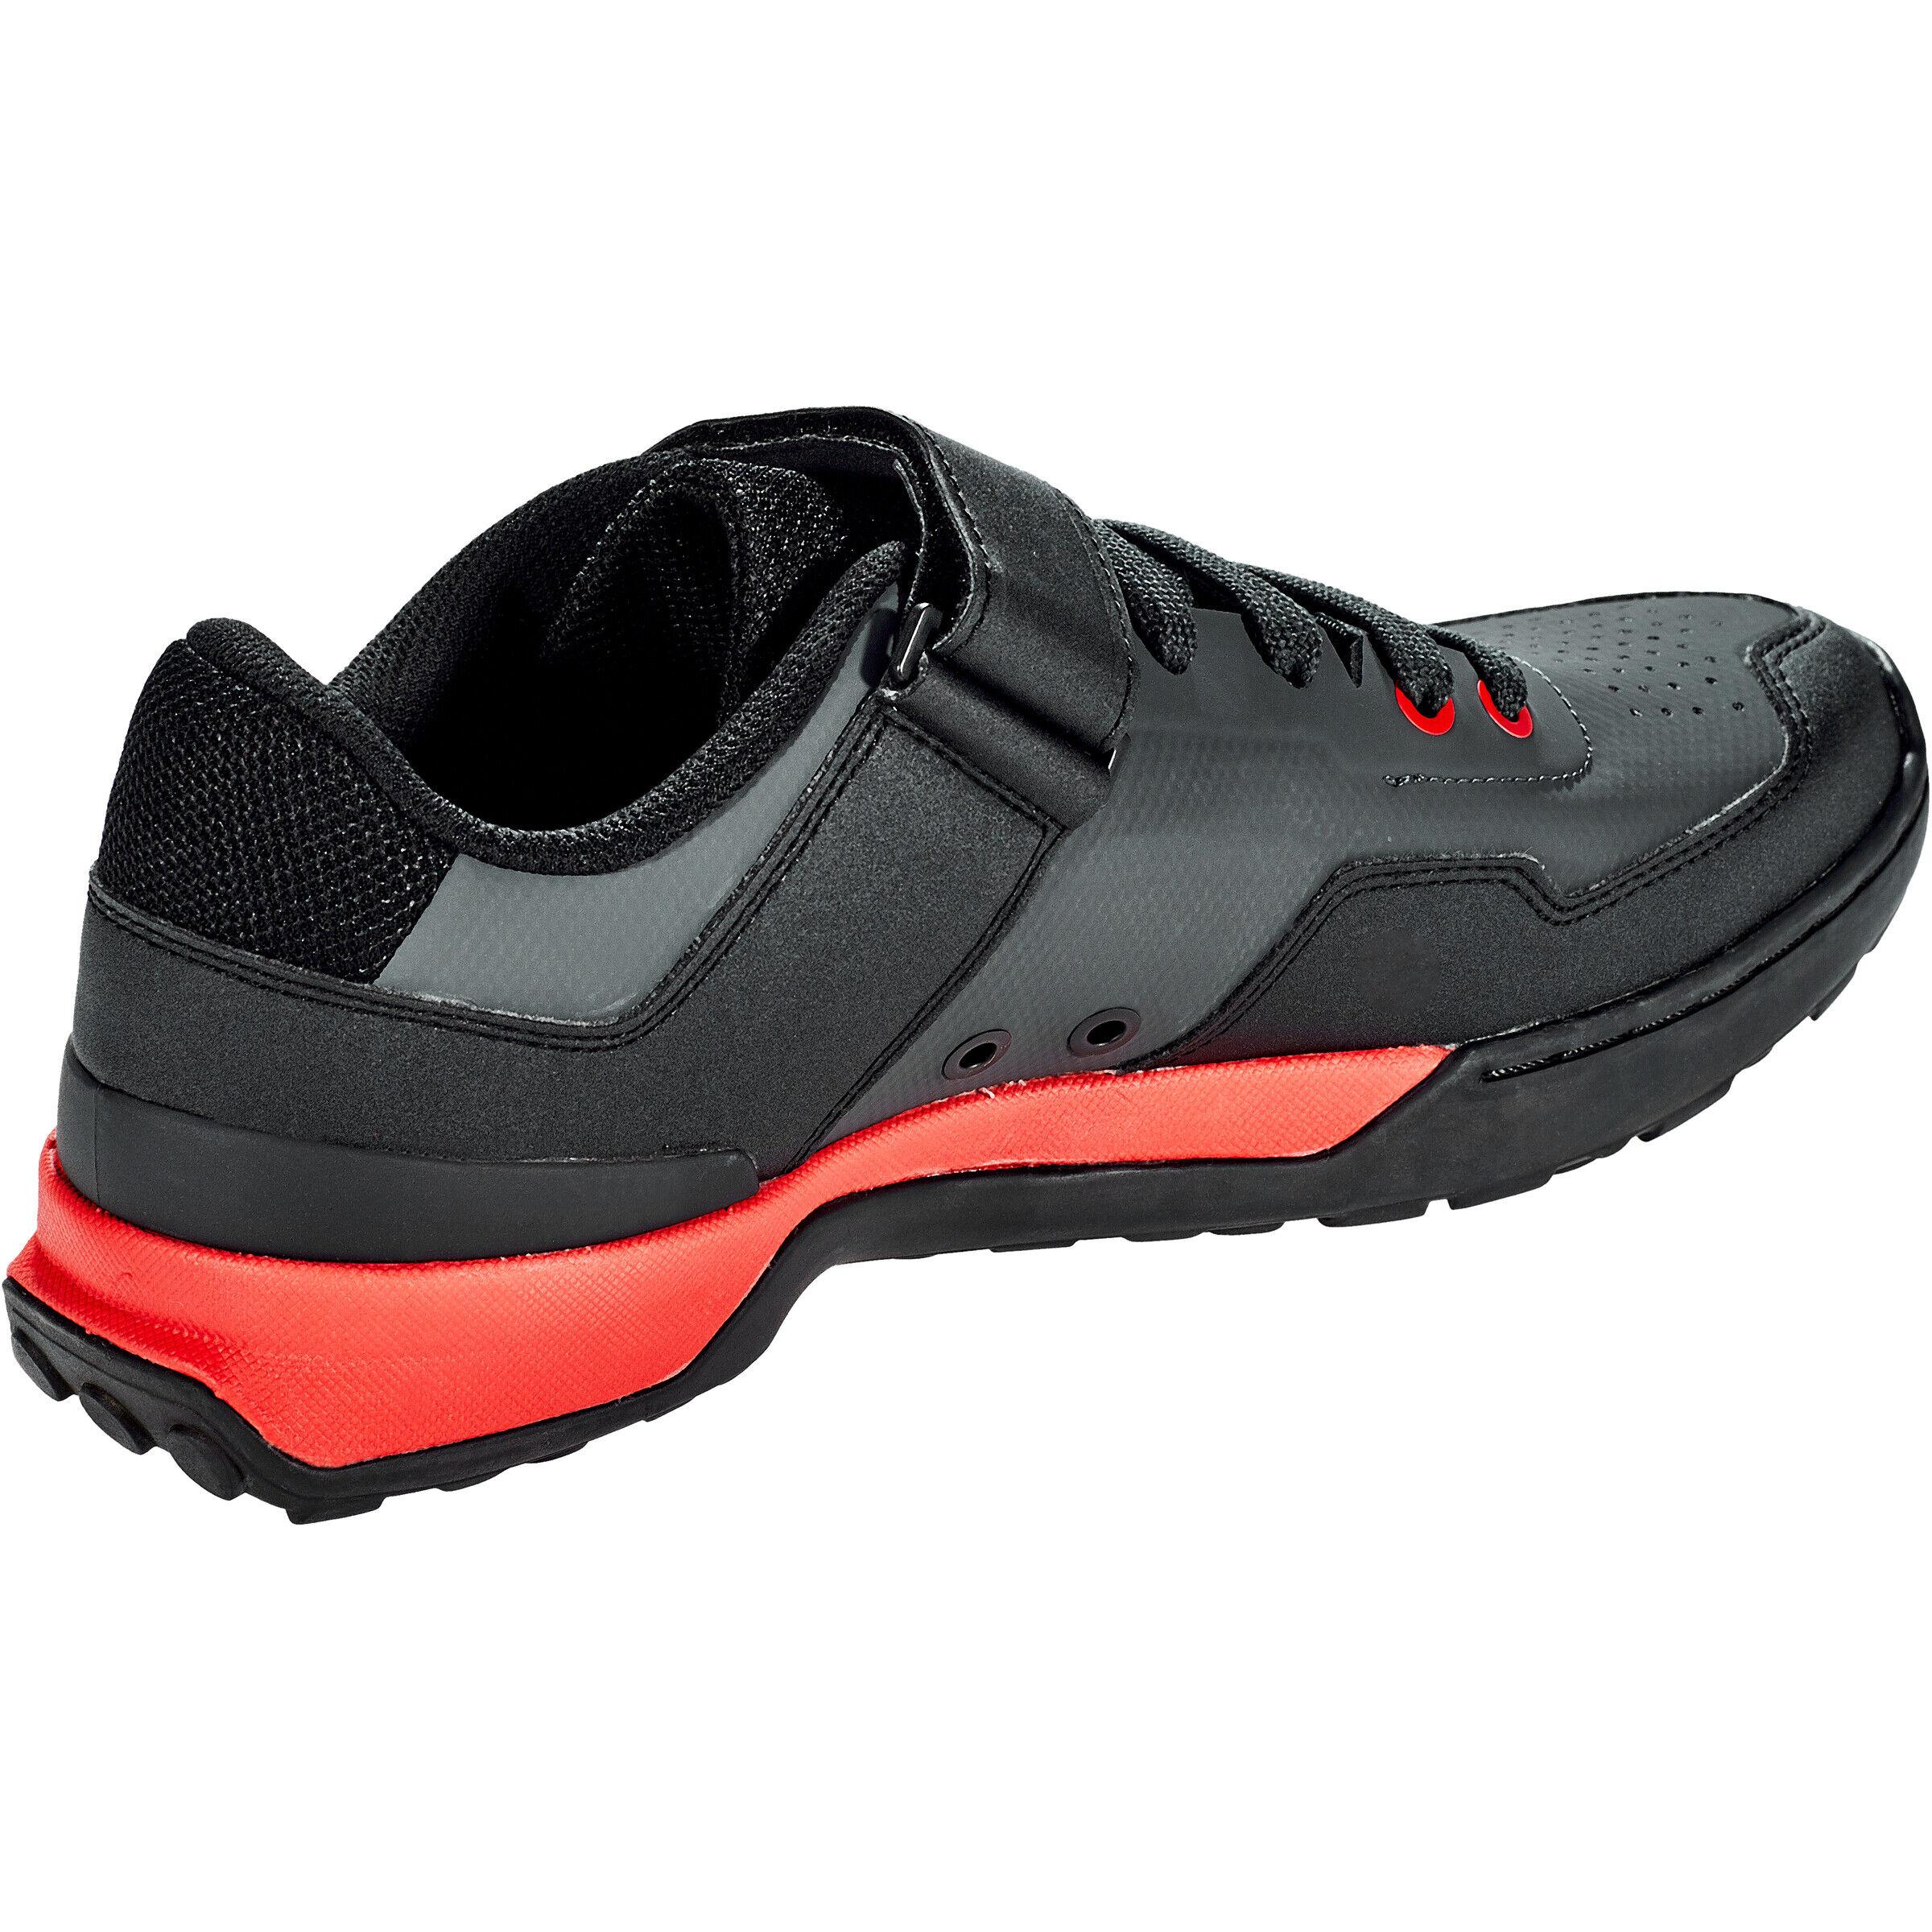 adidas Five Ten Kestrel Lace Mountain Bike Schuhe Herren carboncore blackred